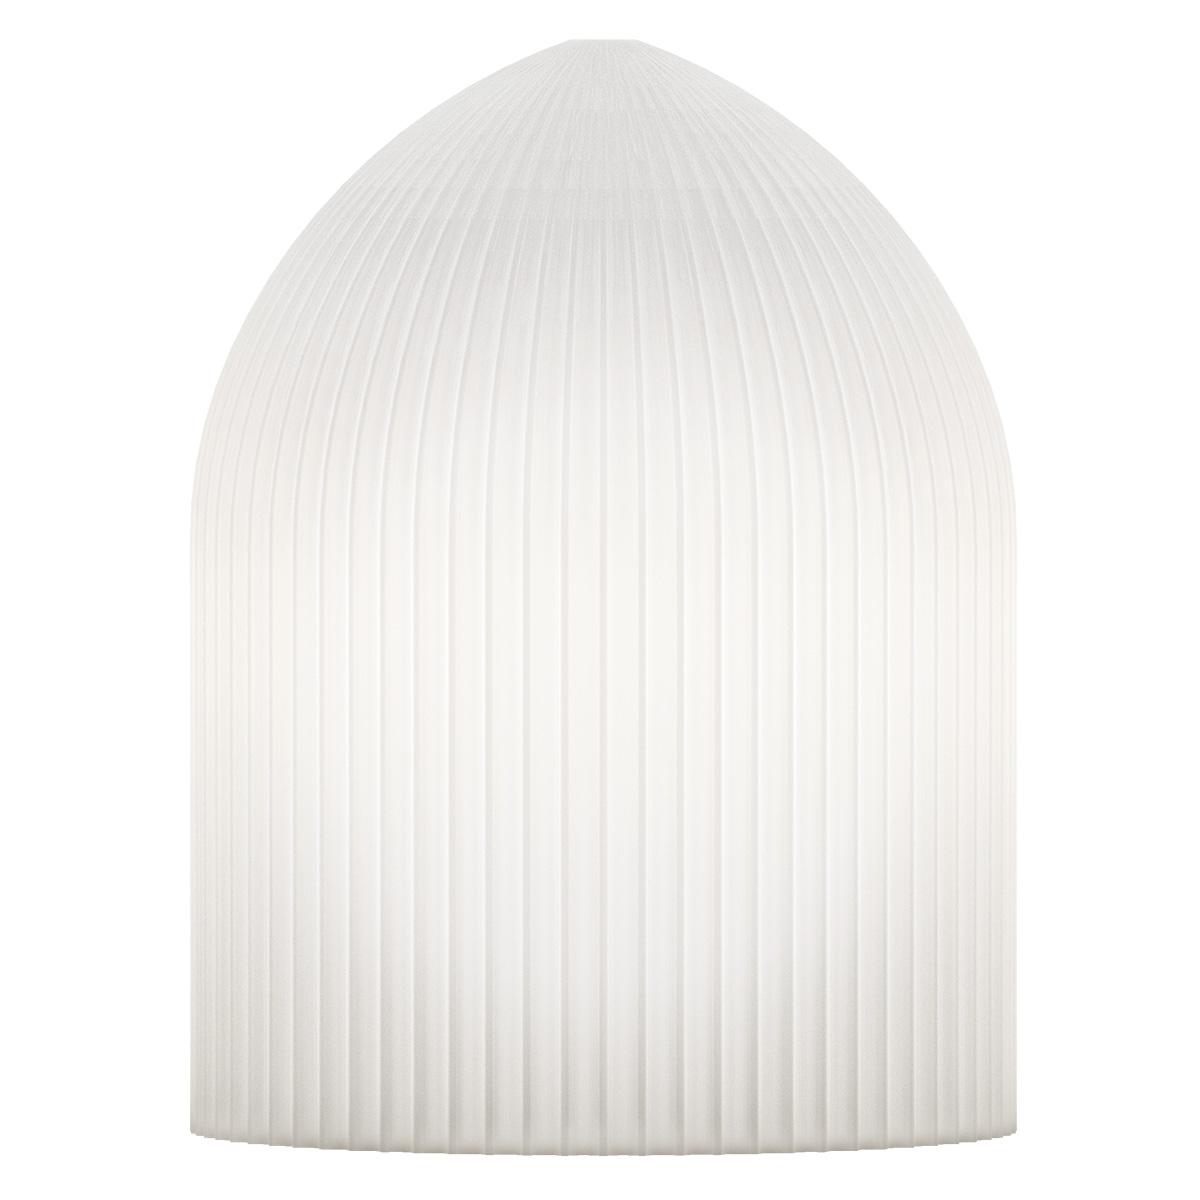 Vita copenhagen lampeskærm - Ripples - Curve - Hvid